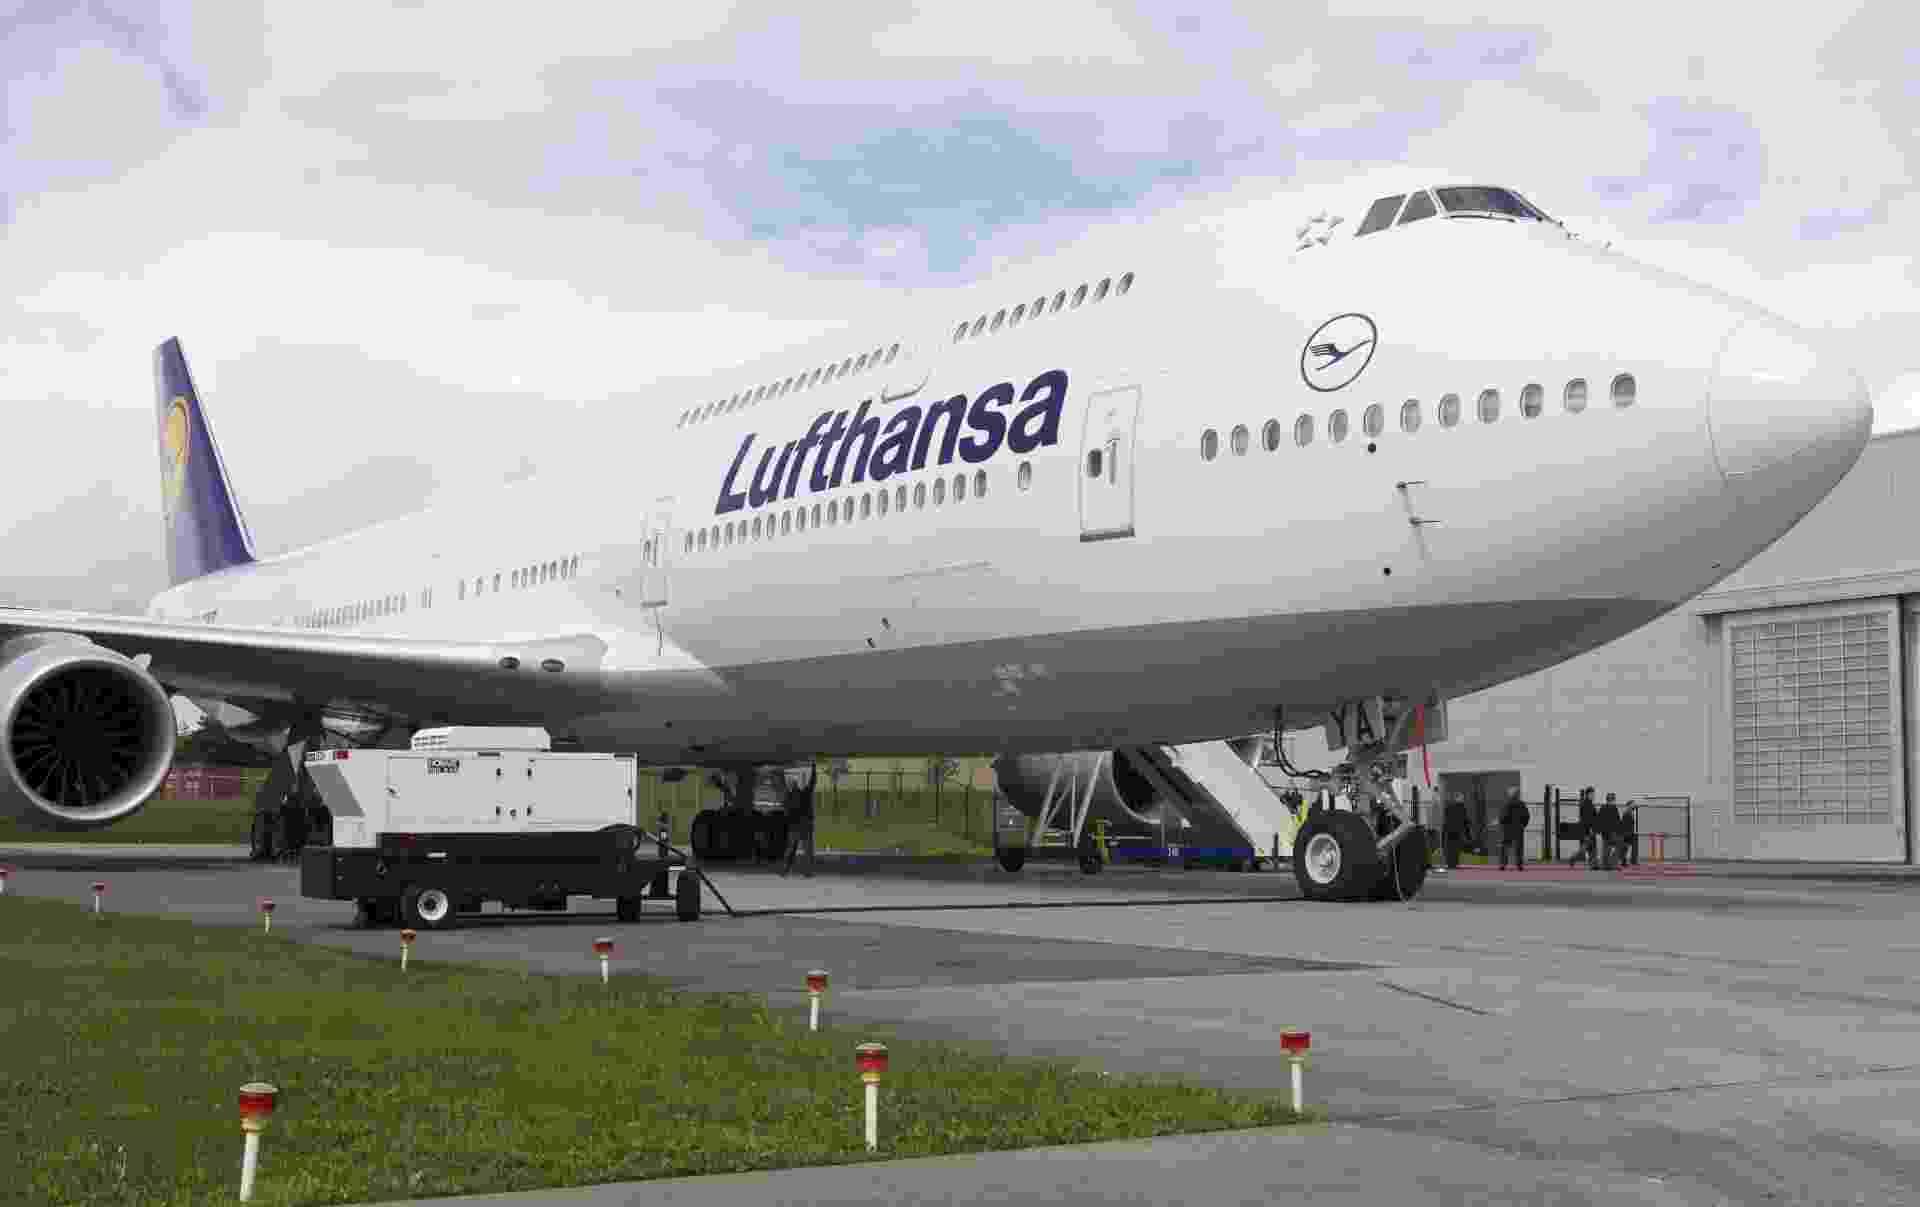 Lufthansa estreia o Boeing 747-8 Intercontinental - Stephen Brashear/Getty Images/AFP